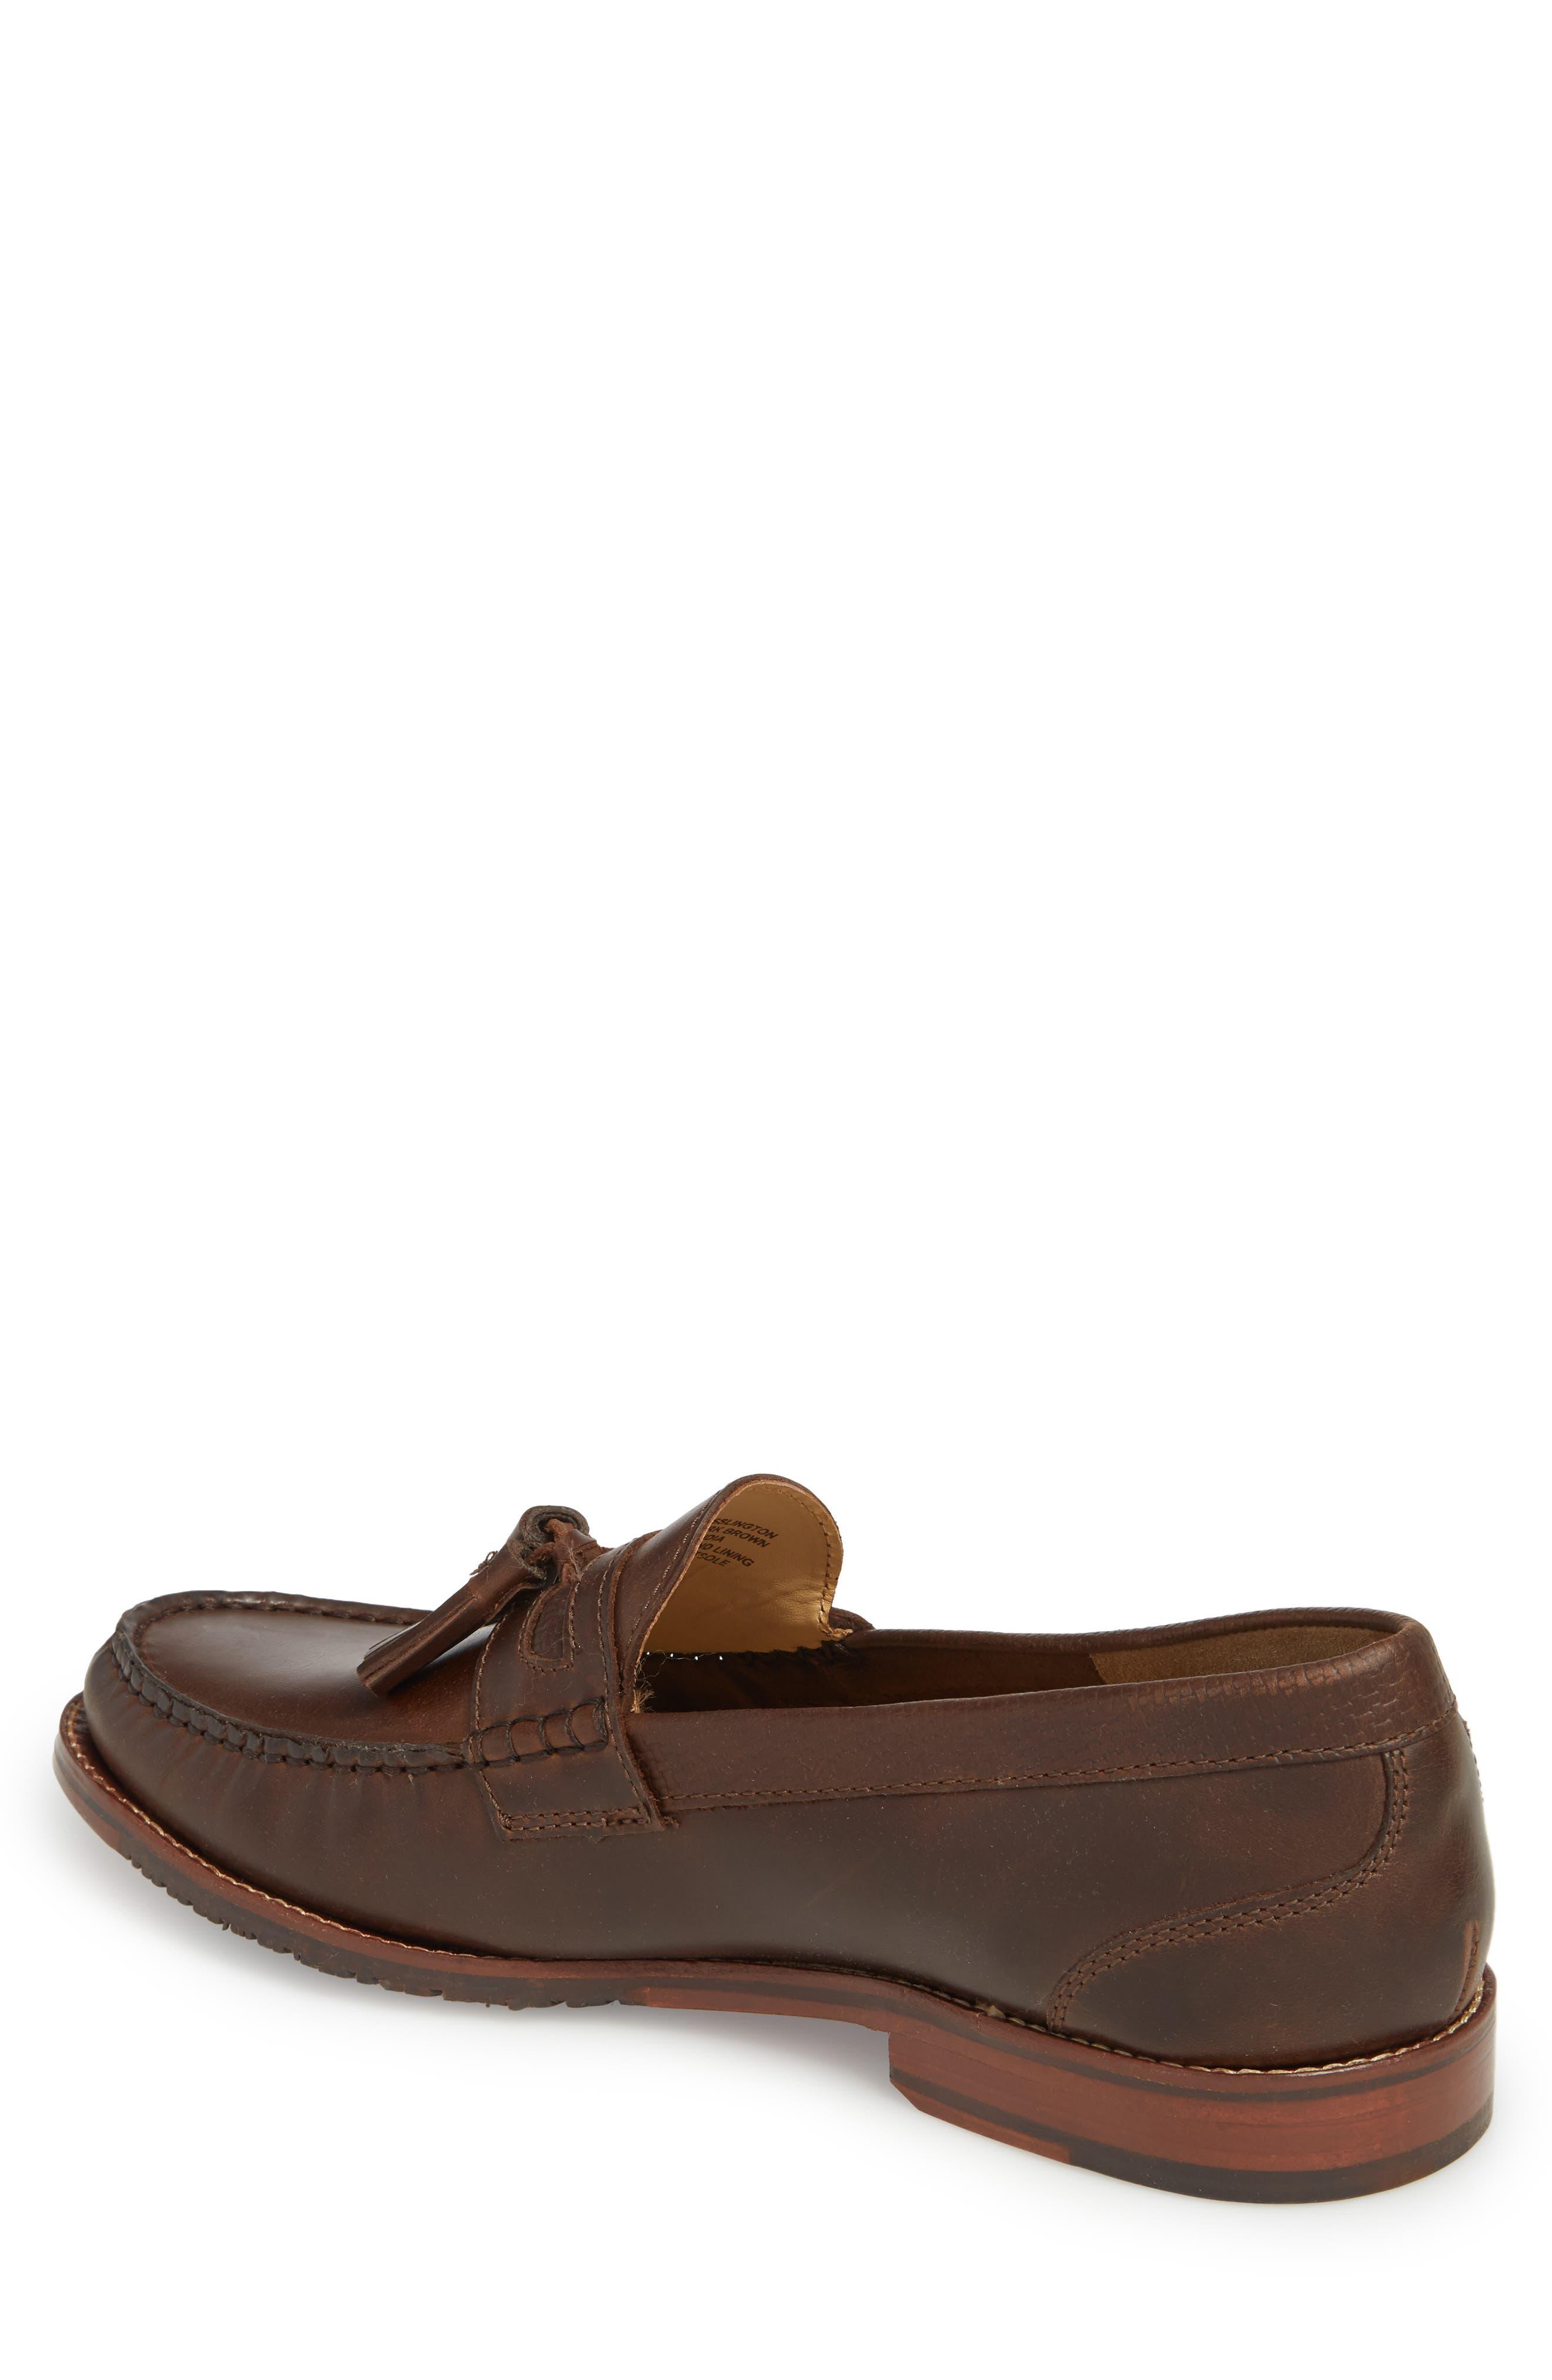 Tasslington Loafer,                             Alternate thumbnail 2, color,                             Dark Brown Leather